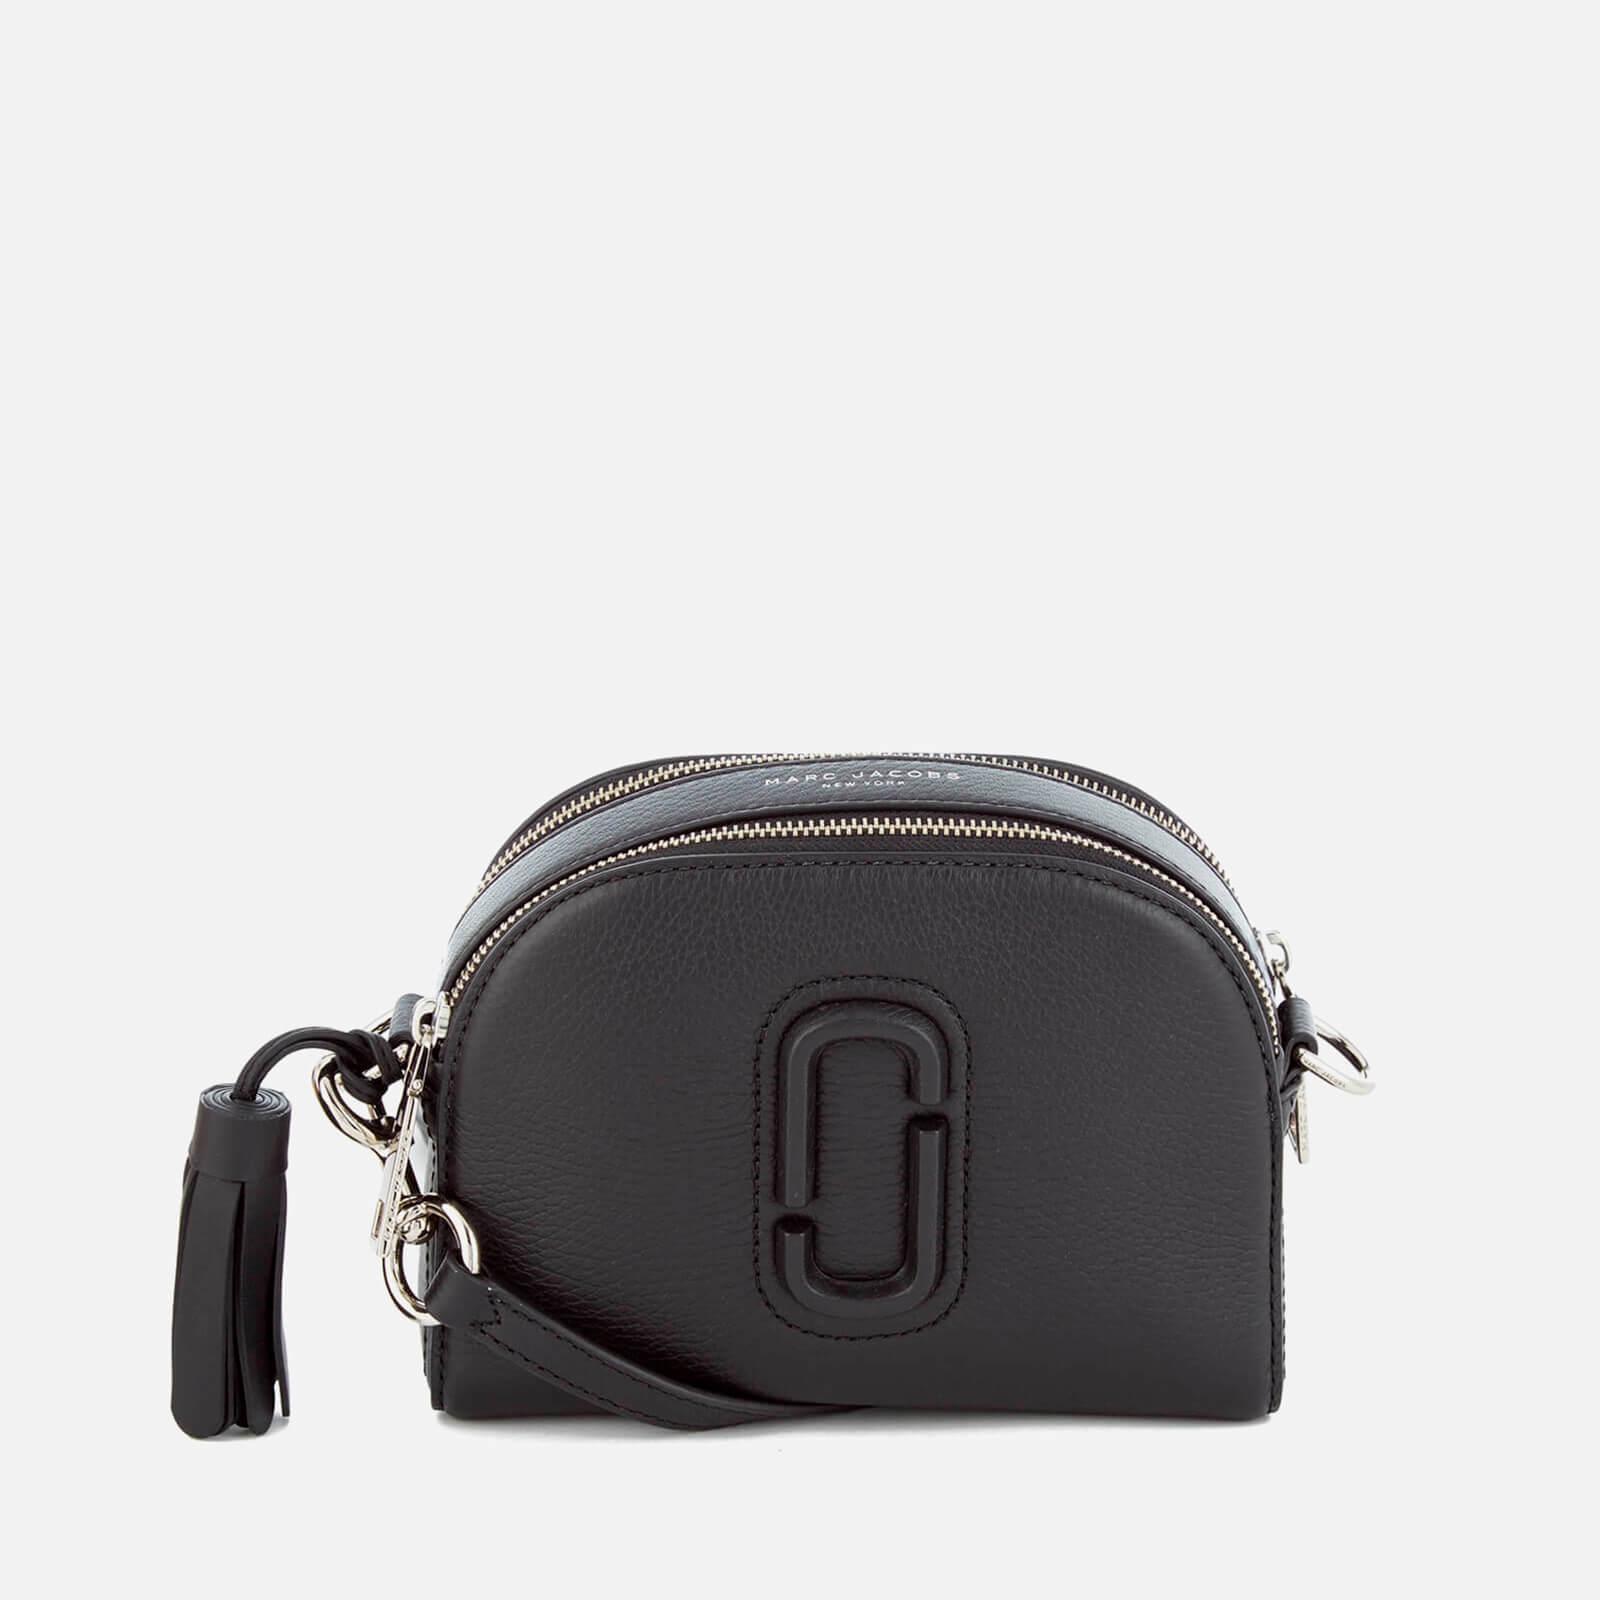 b5c694193 Marc Jacobs Women's Shutter Leather Shoulder Cross Body Bag - Black - Free  UK Delivery over £50